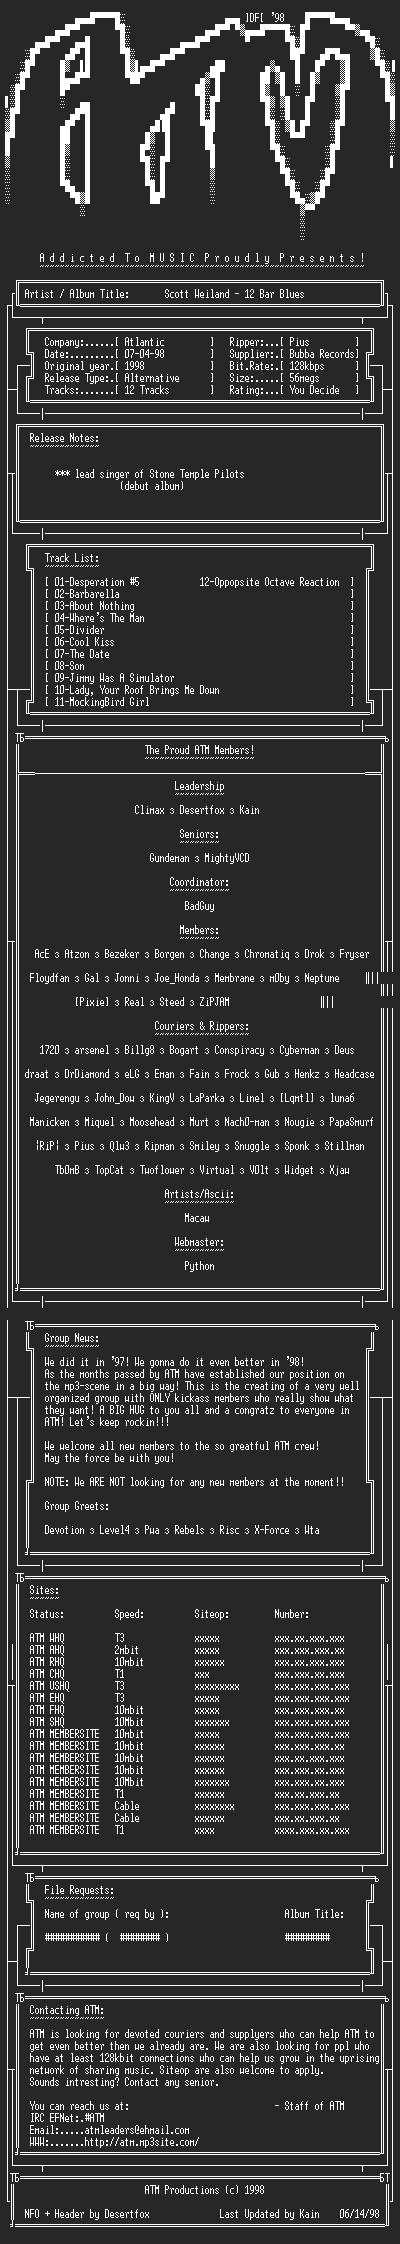 NFO file for Scott_Weiland_-_12_Bar_Blues_(1998)-ATM